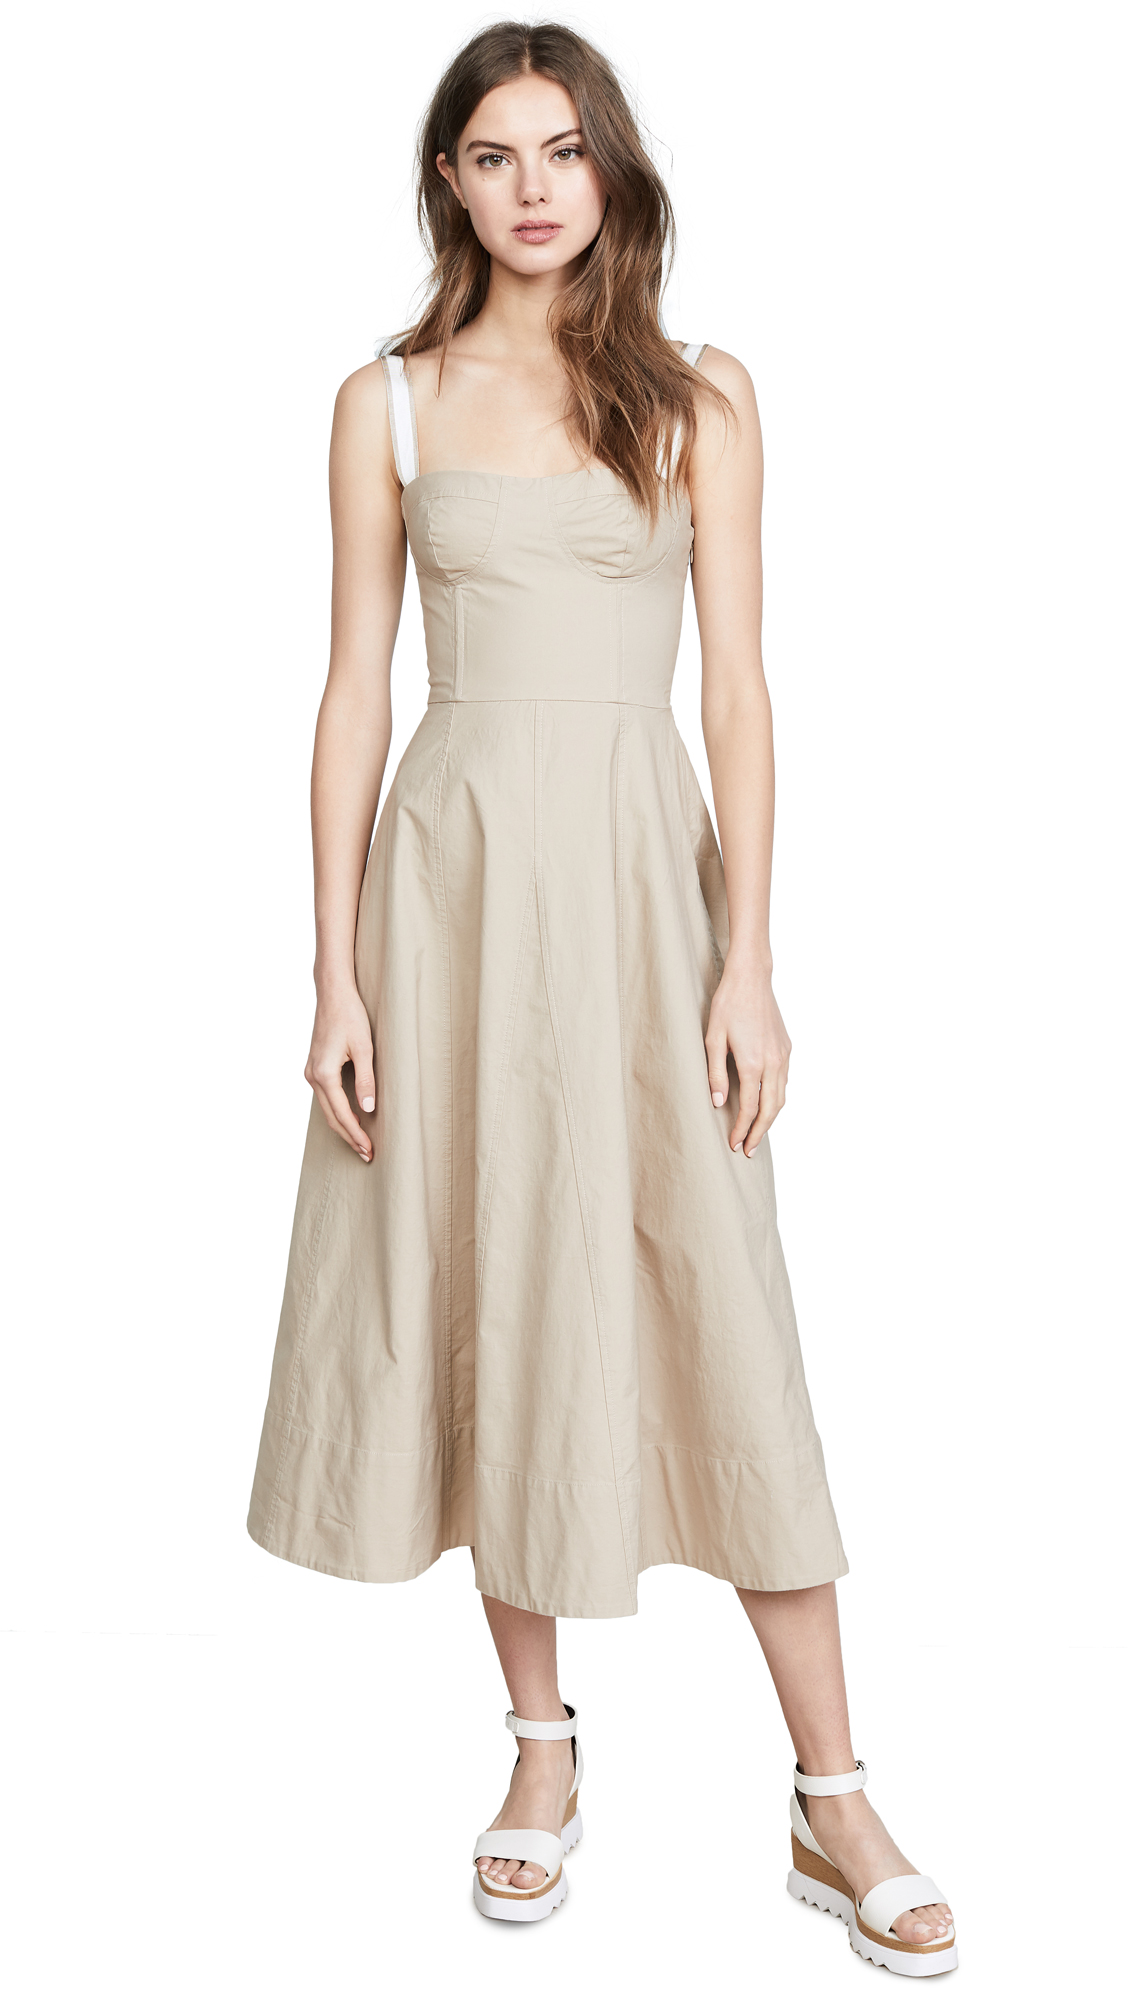 Joie Briel Dress